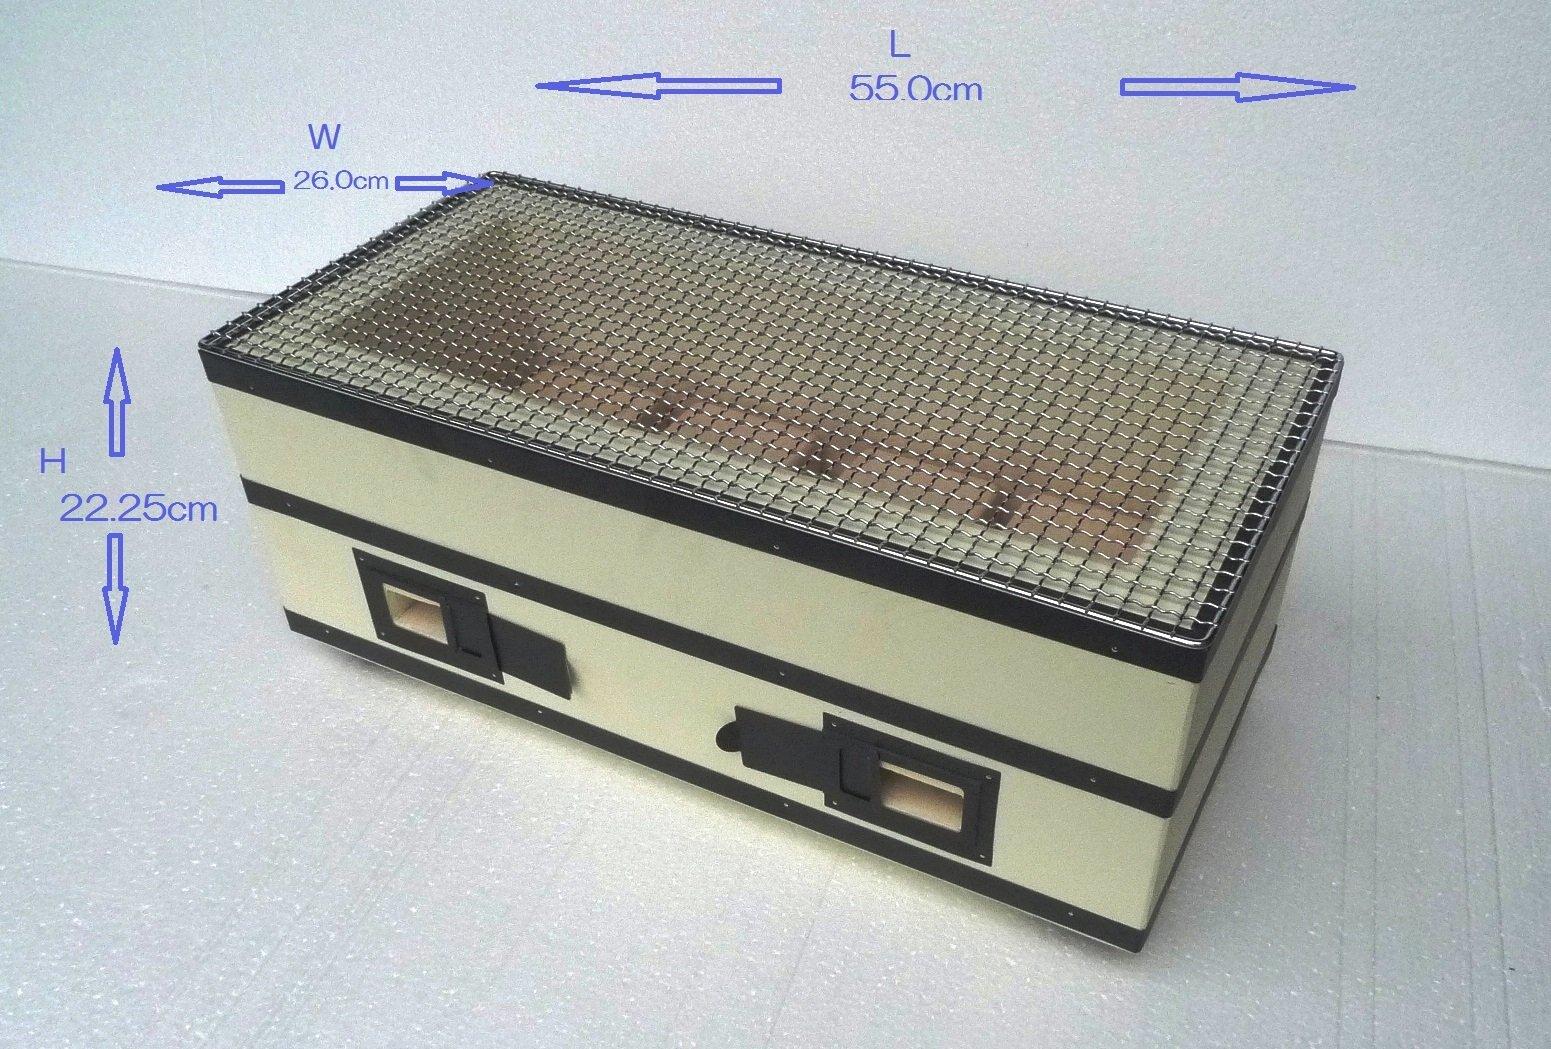 binchotan Japanese excellent charcoal konro grill/Hand made/Noto Ishikawa made by binchotan (Image #2)